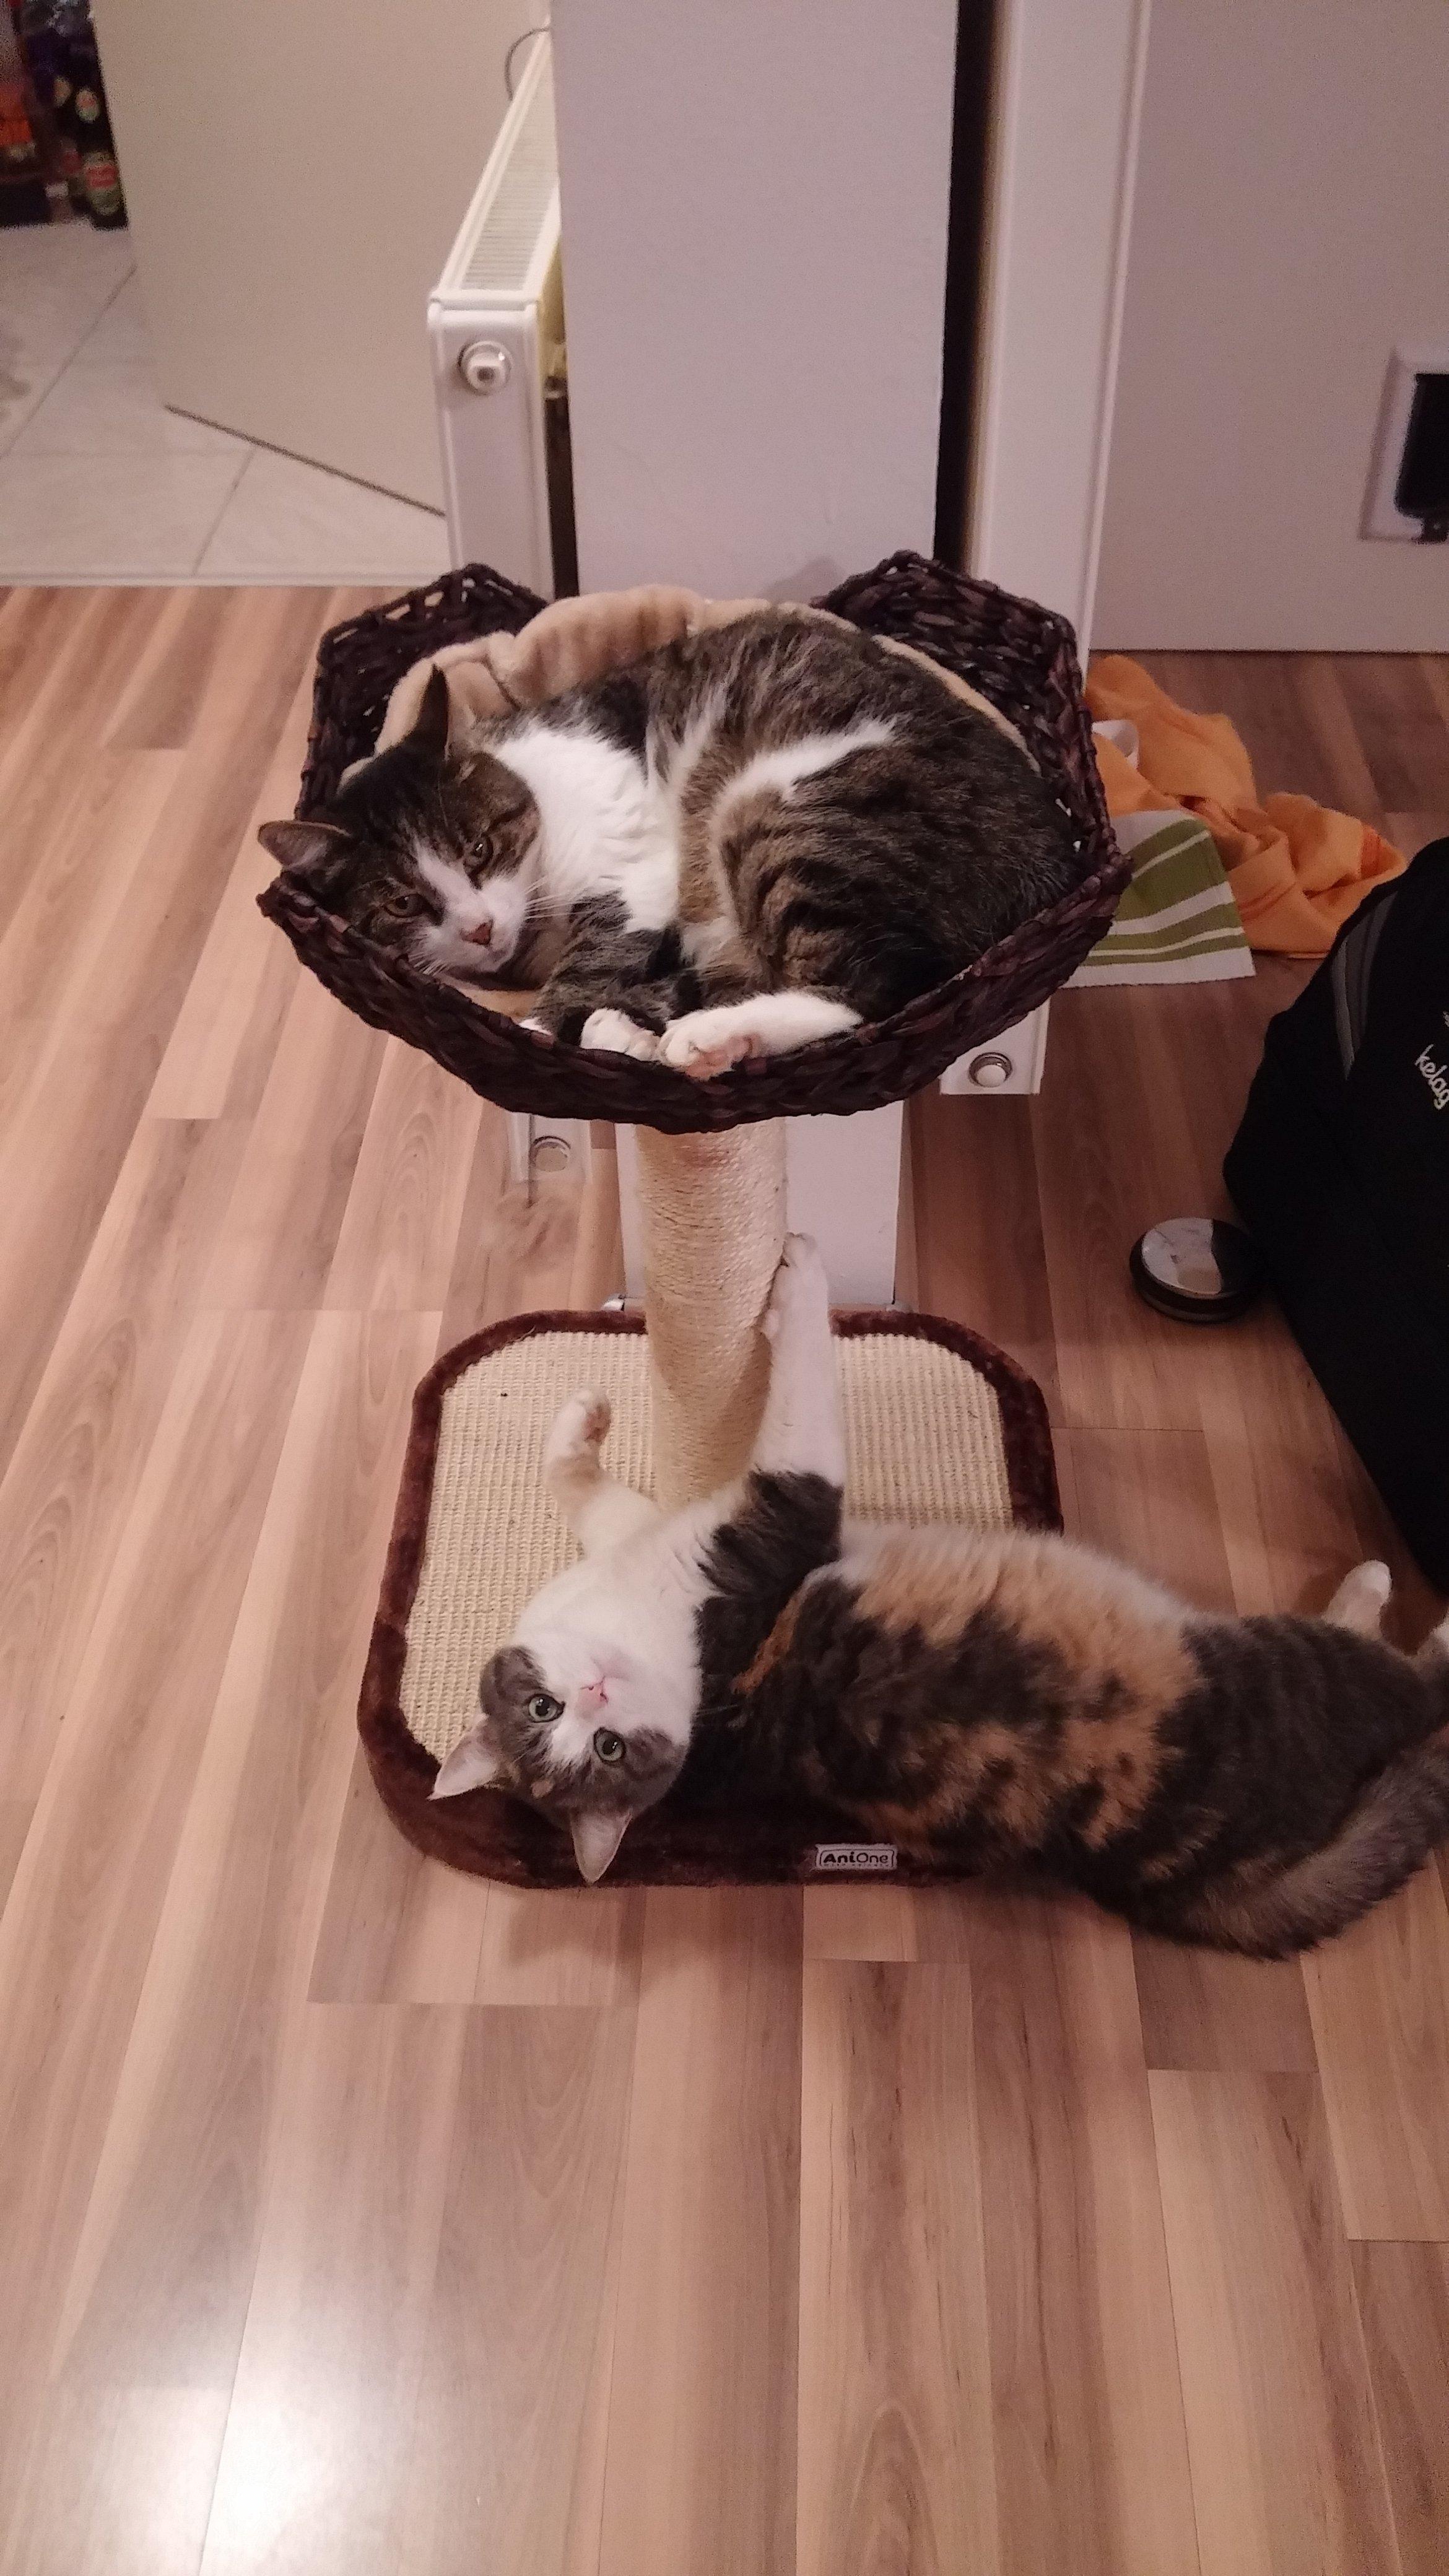 woche 3 gesunde fitte katzen purina one katzenfutter test. Black Bedroom Furniture Sets. Home Design Ideas